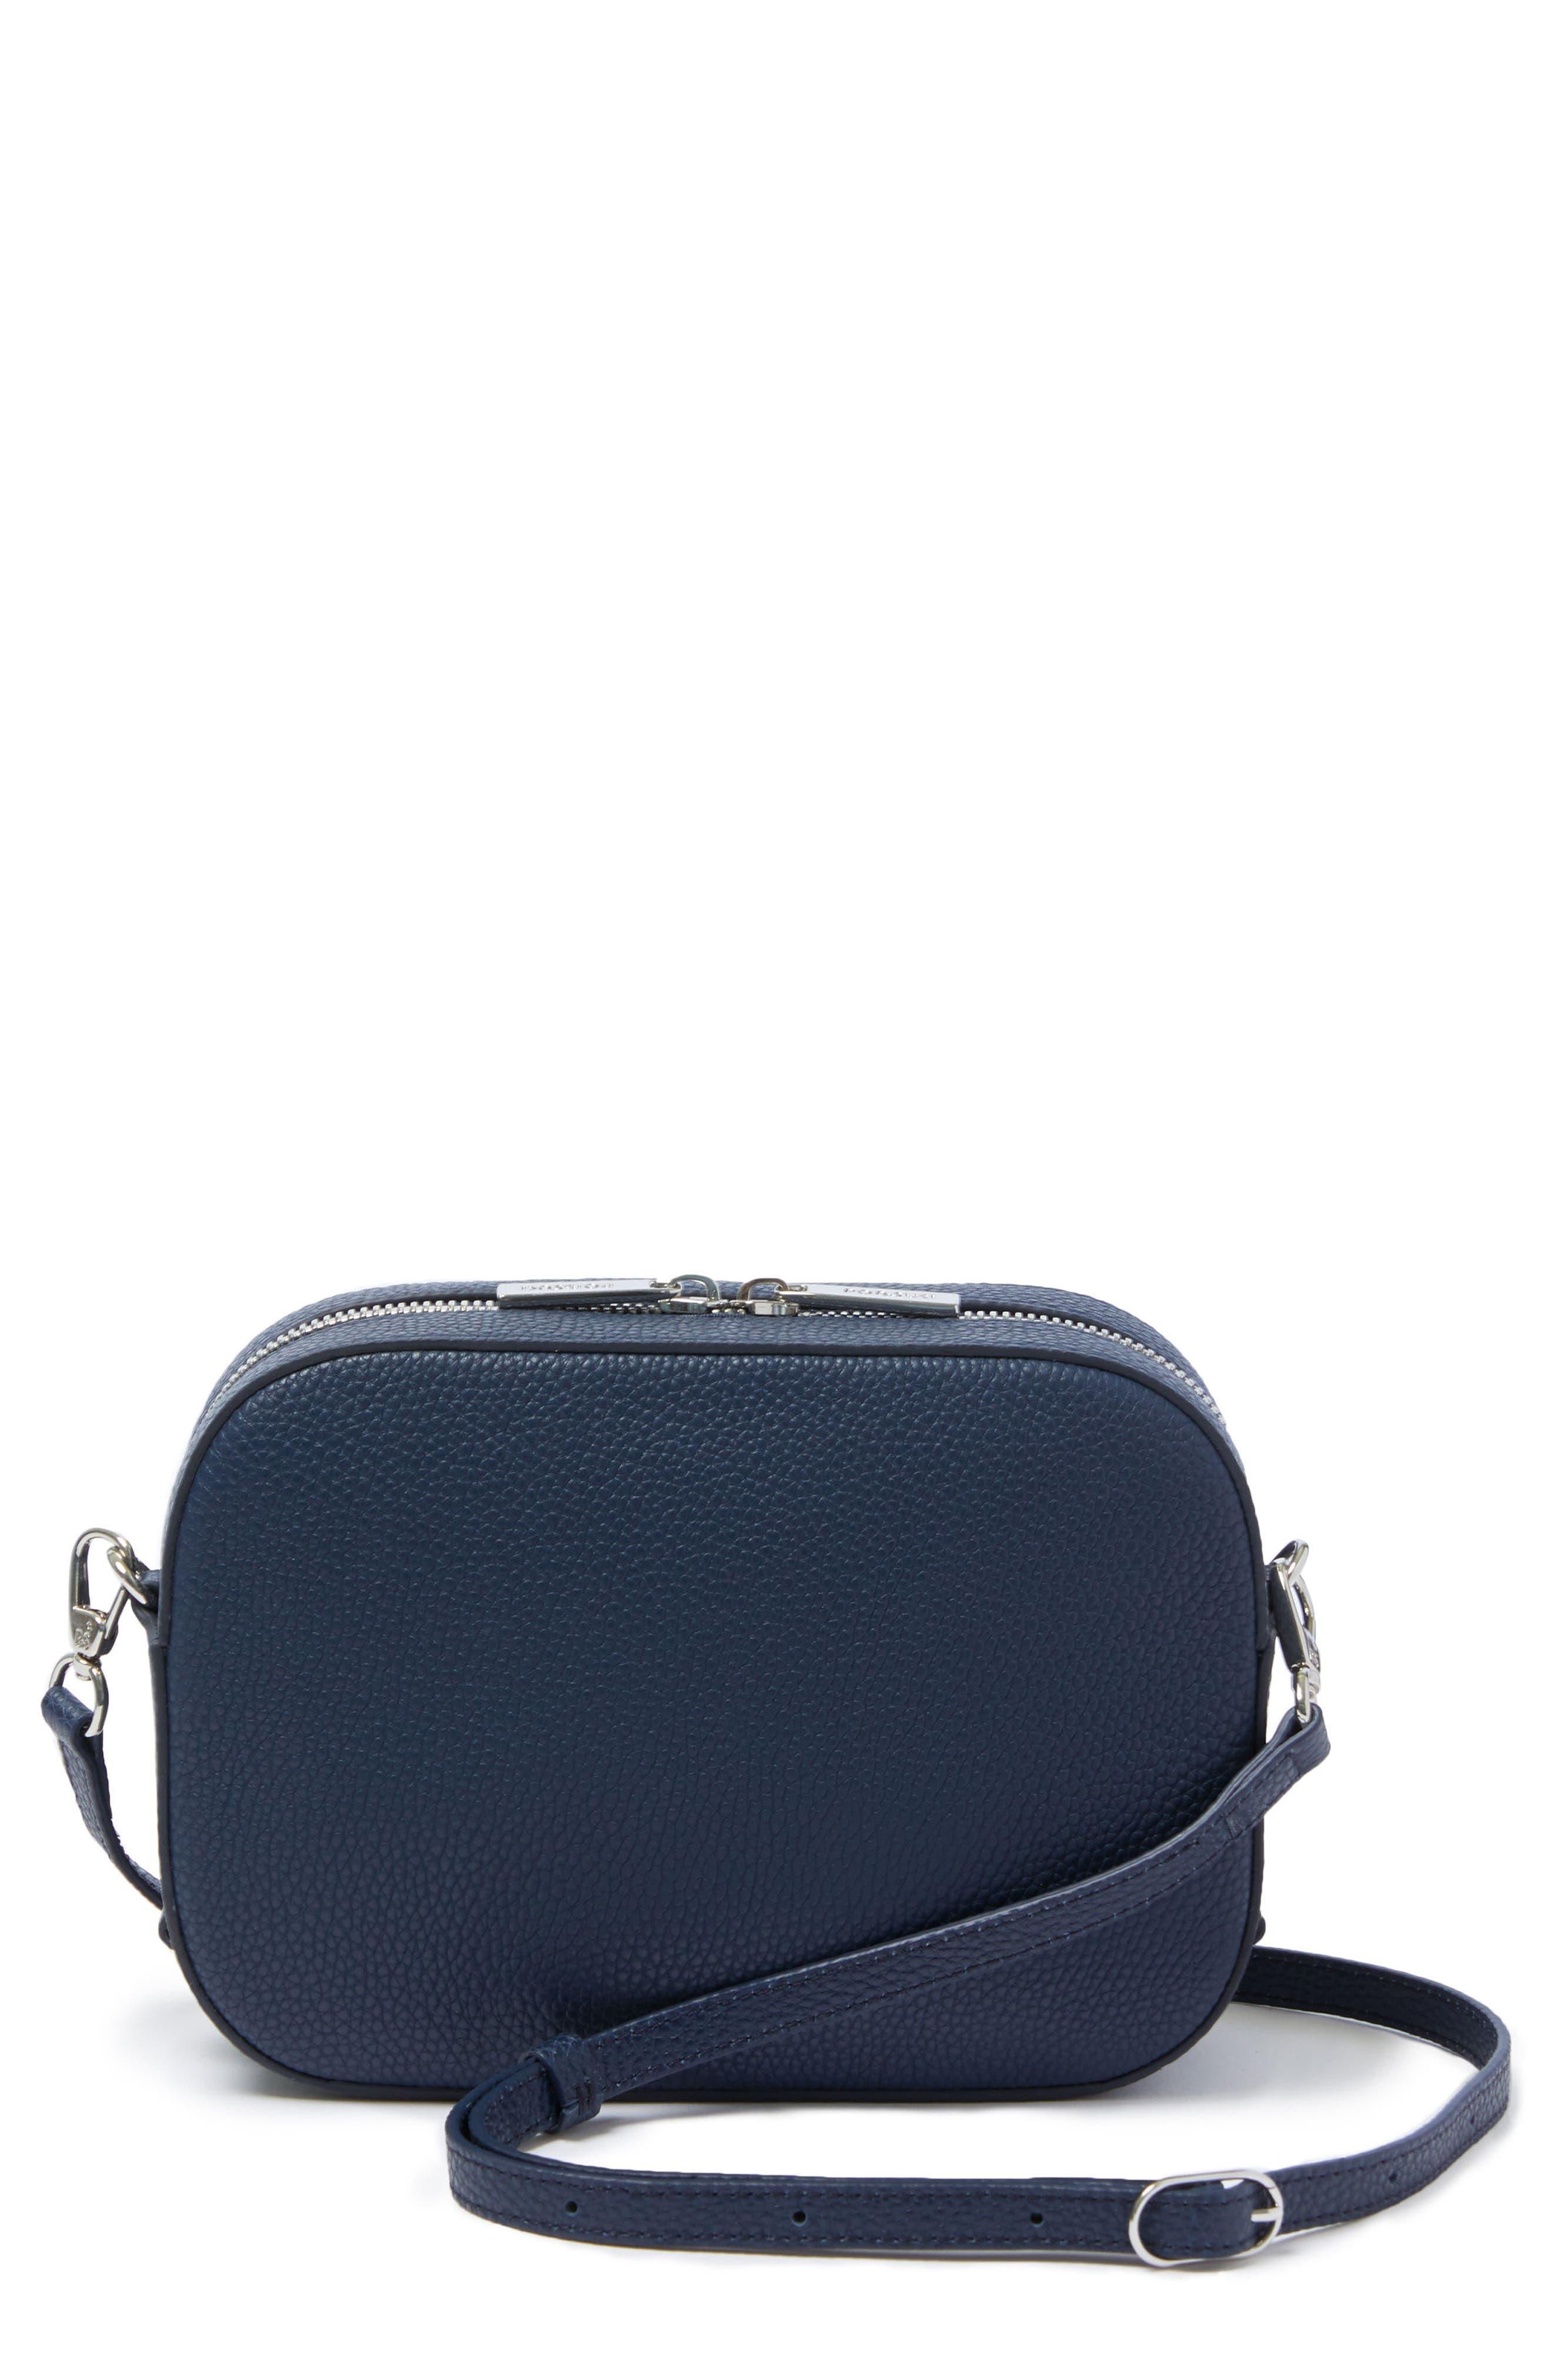 Alternate Image 1 Selected - Pop & Suki Bigger Leather Camera Bag (Nordstrom Exclusive)